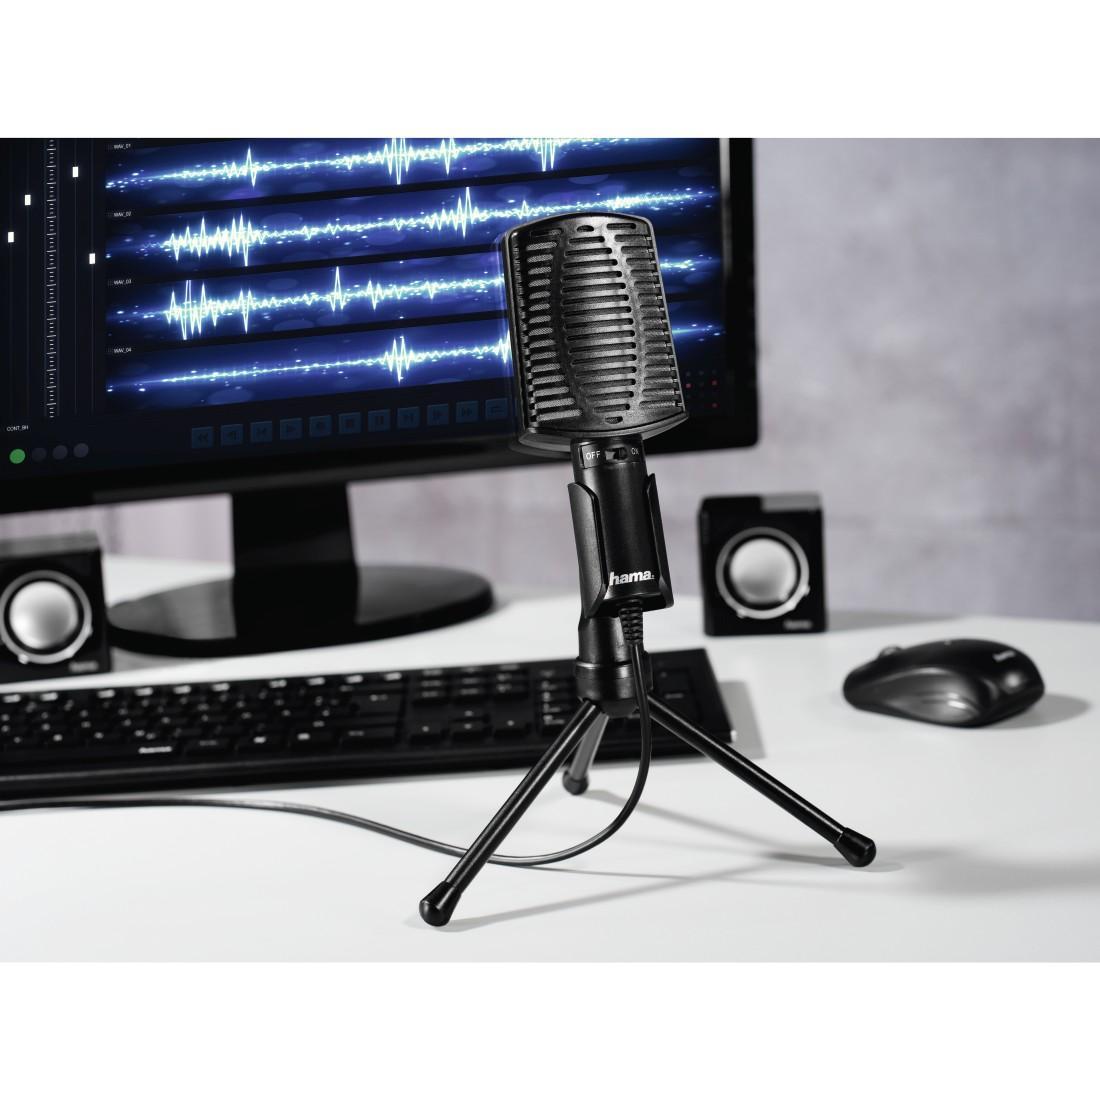 Настолен микрофон HAMA MIC-USB Allround, за PC/лаптоп, USB, Черен-2